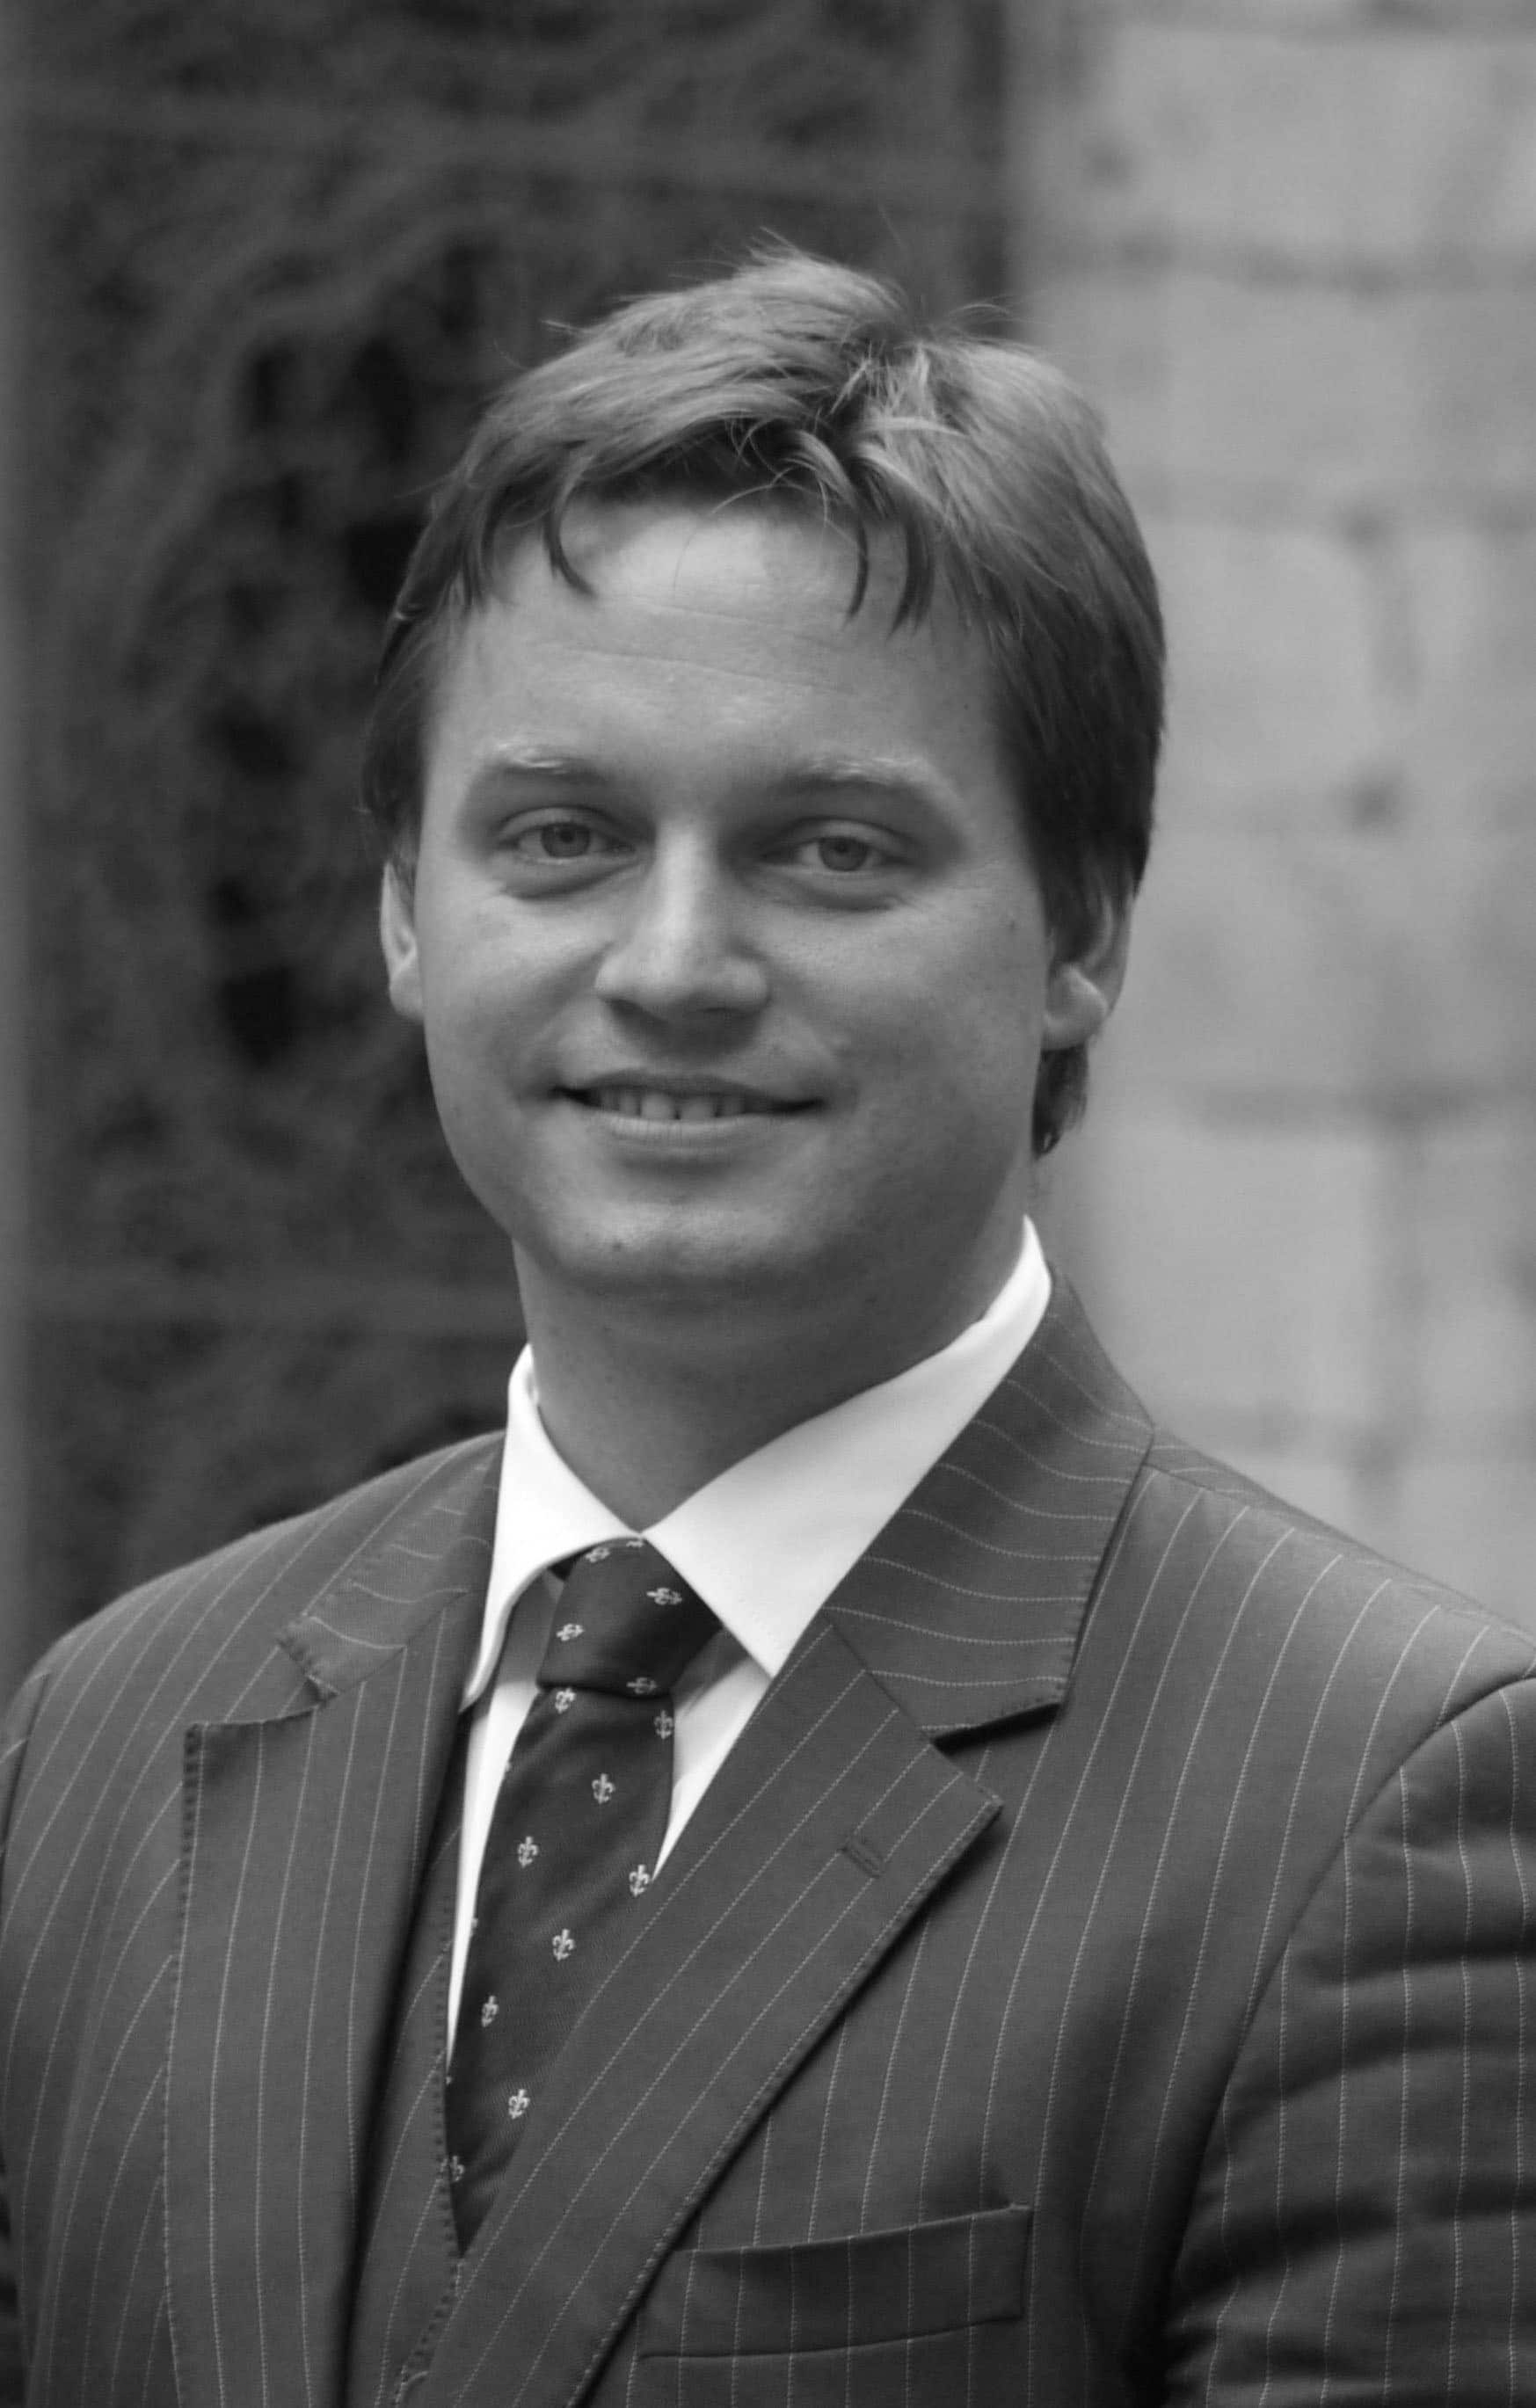 Michael Polak